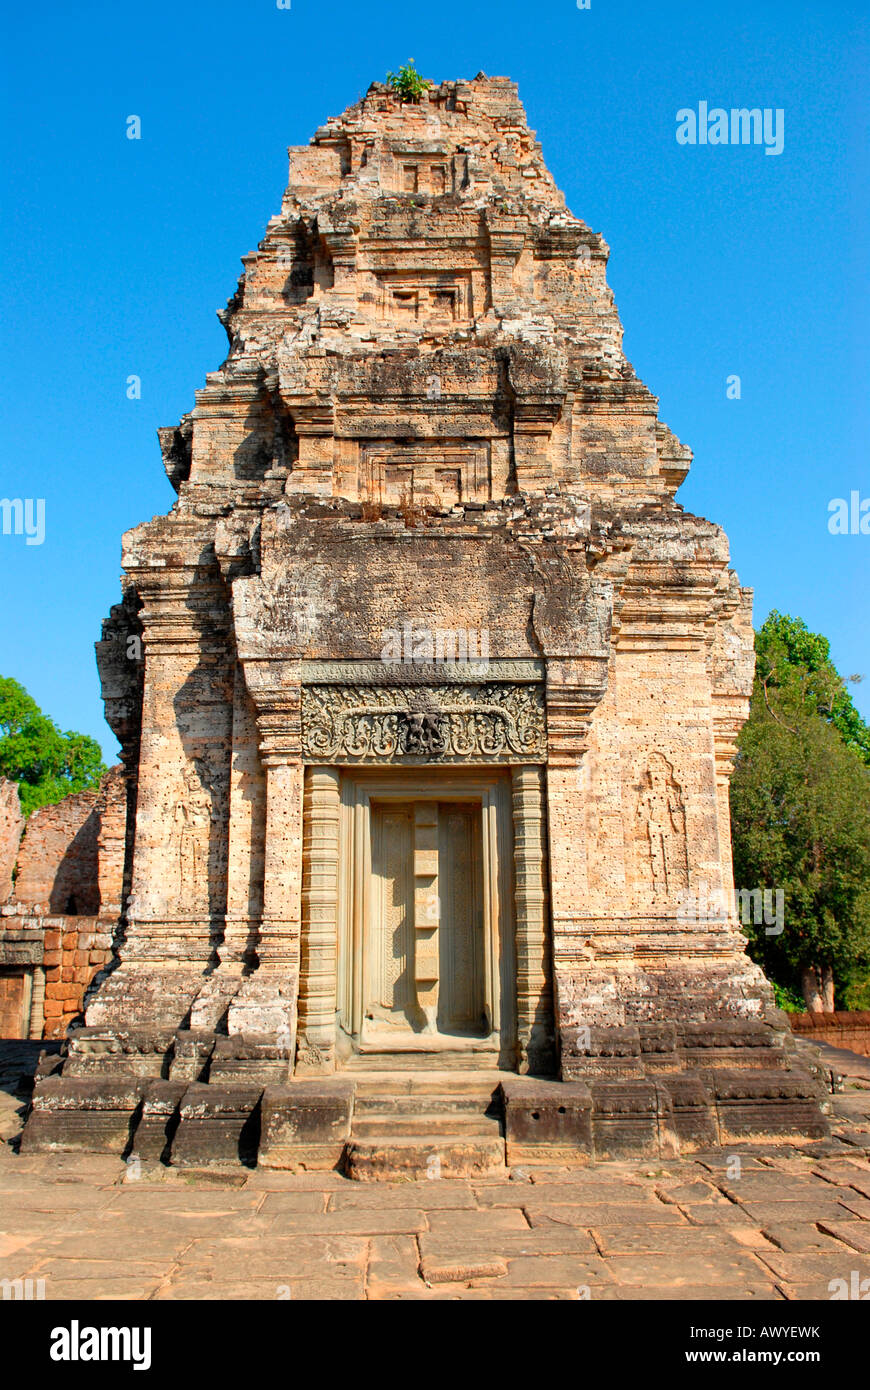 Cambodia , Angkor , Preah Khan Temple , remains of ornate stone edifice building dedicated to Shiva - Stock Image